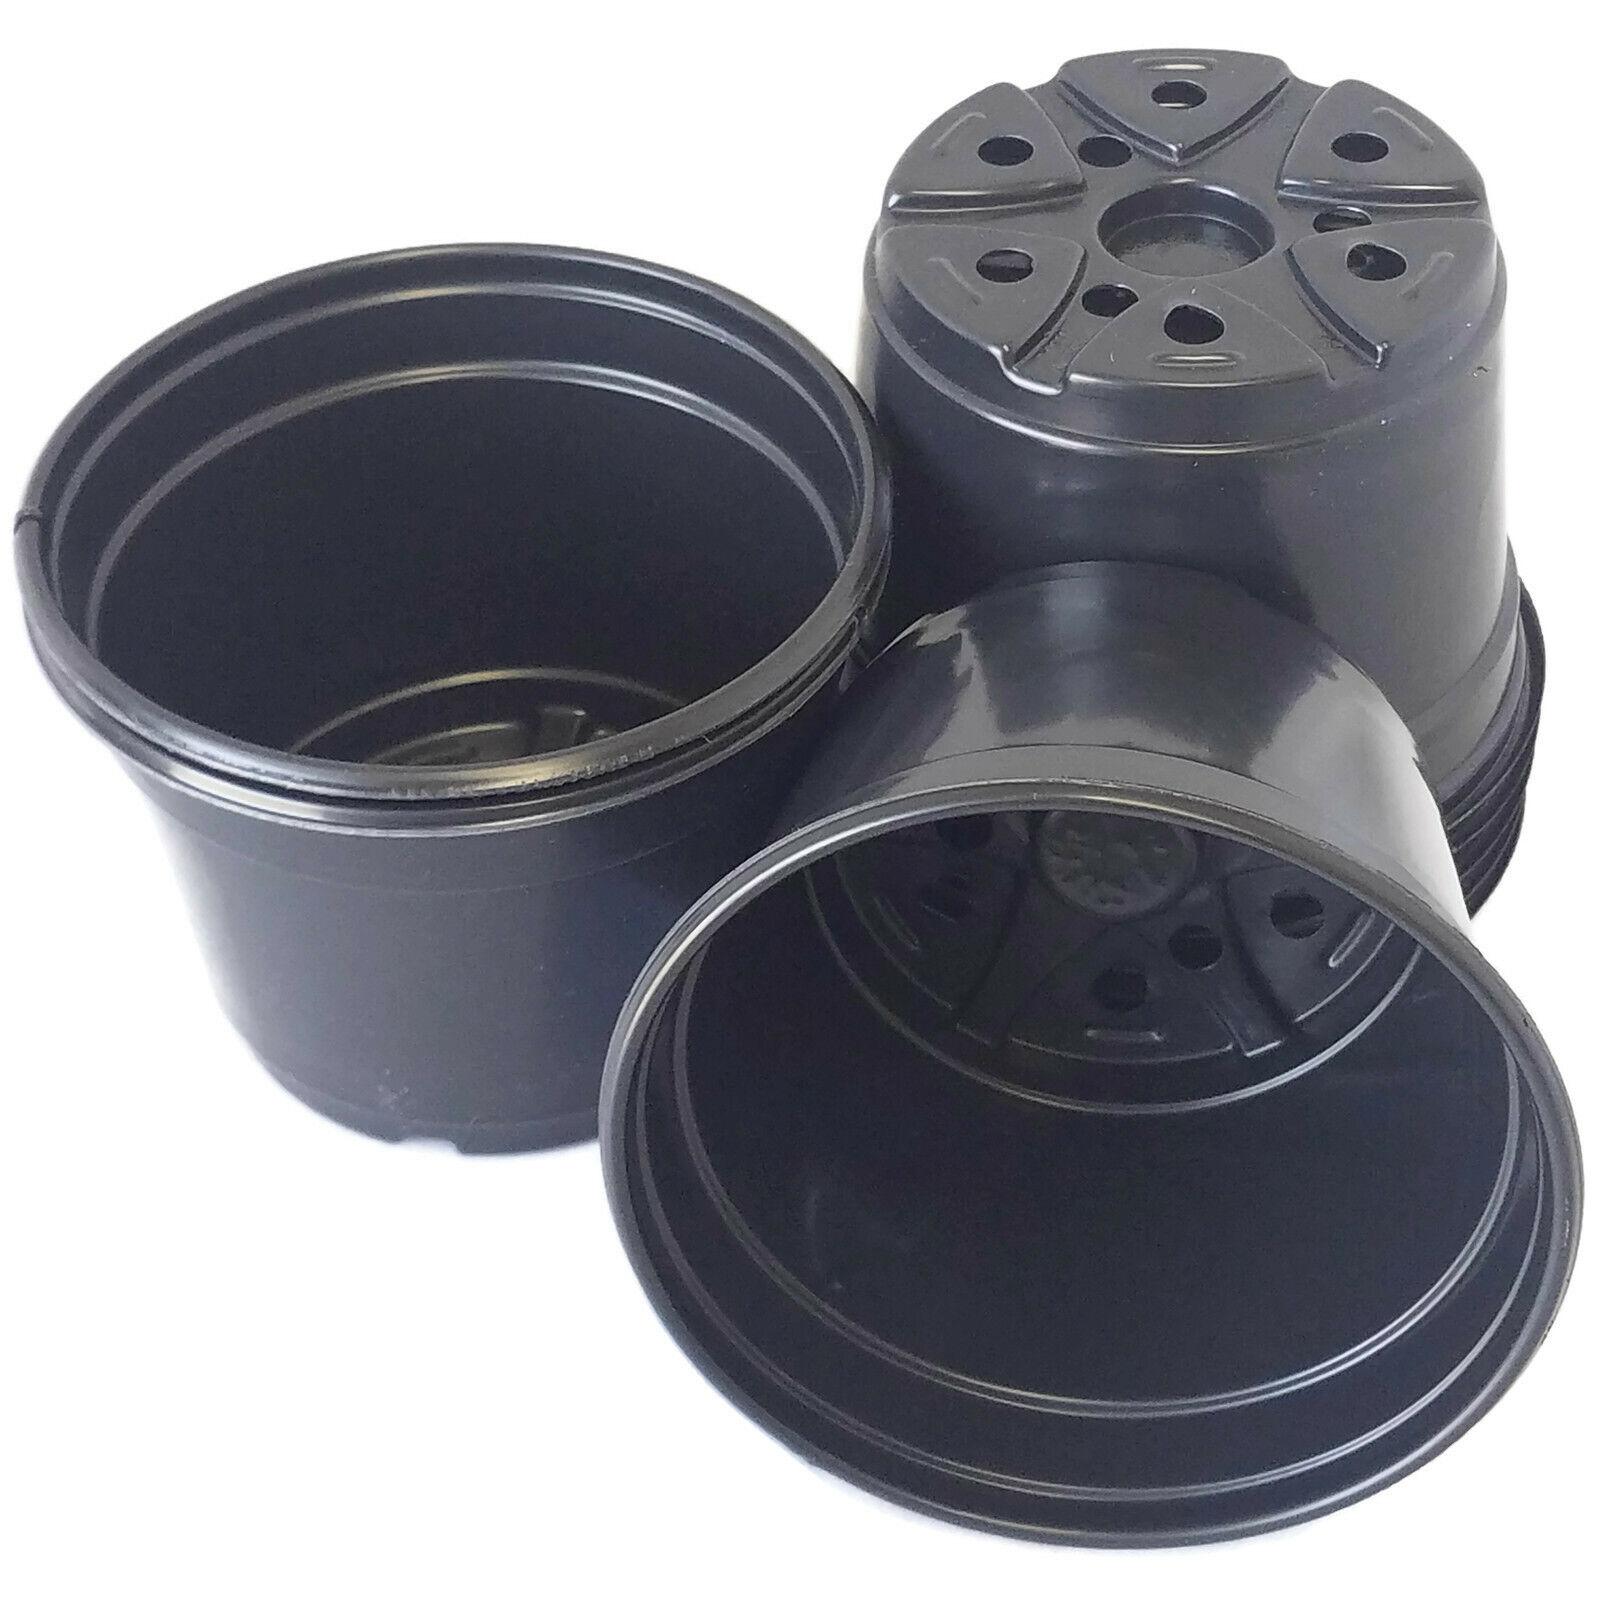 5 inch Round Black Plastic Pots - SET OF 25 - (5